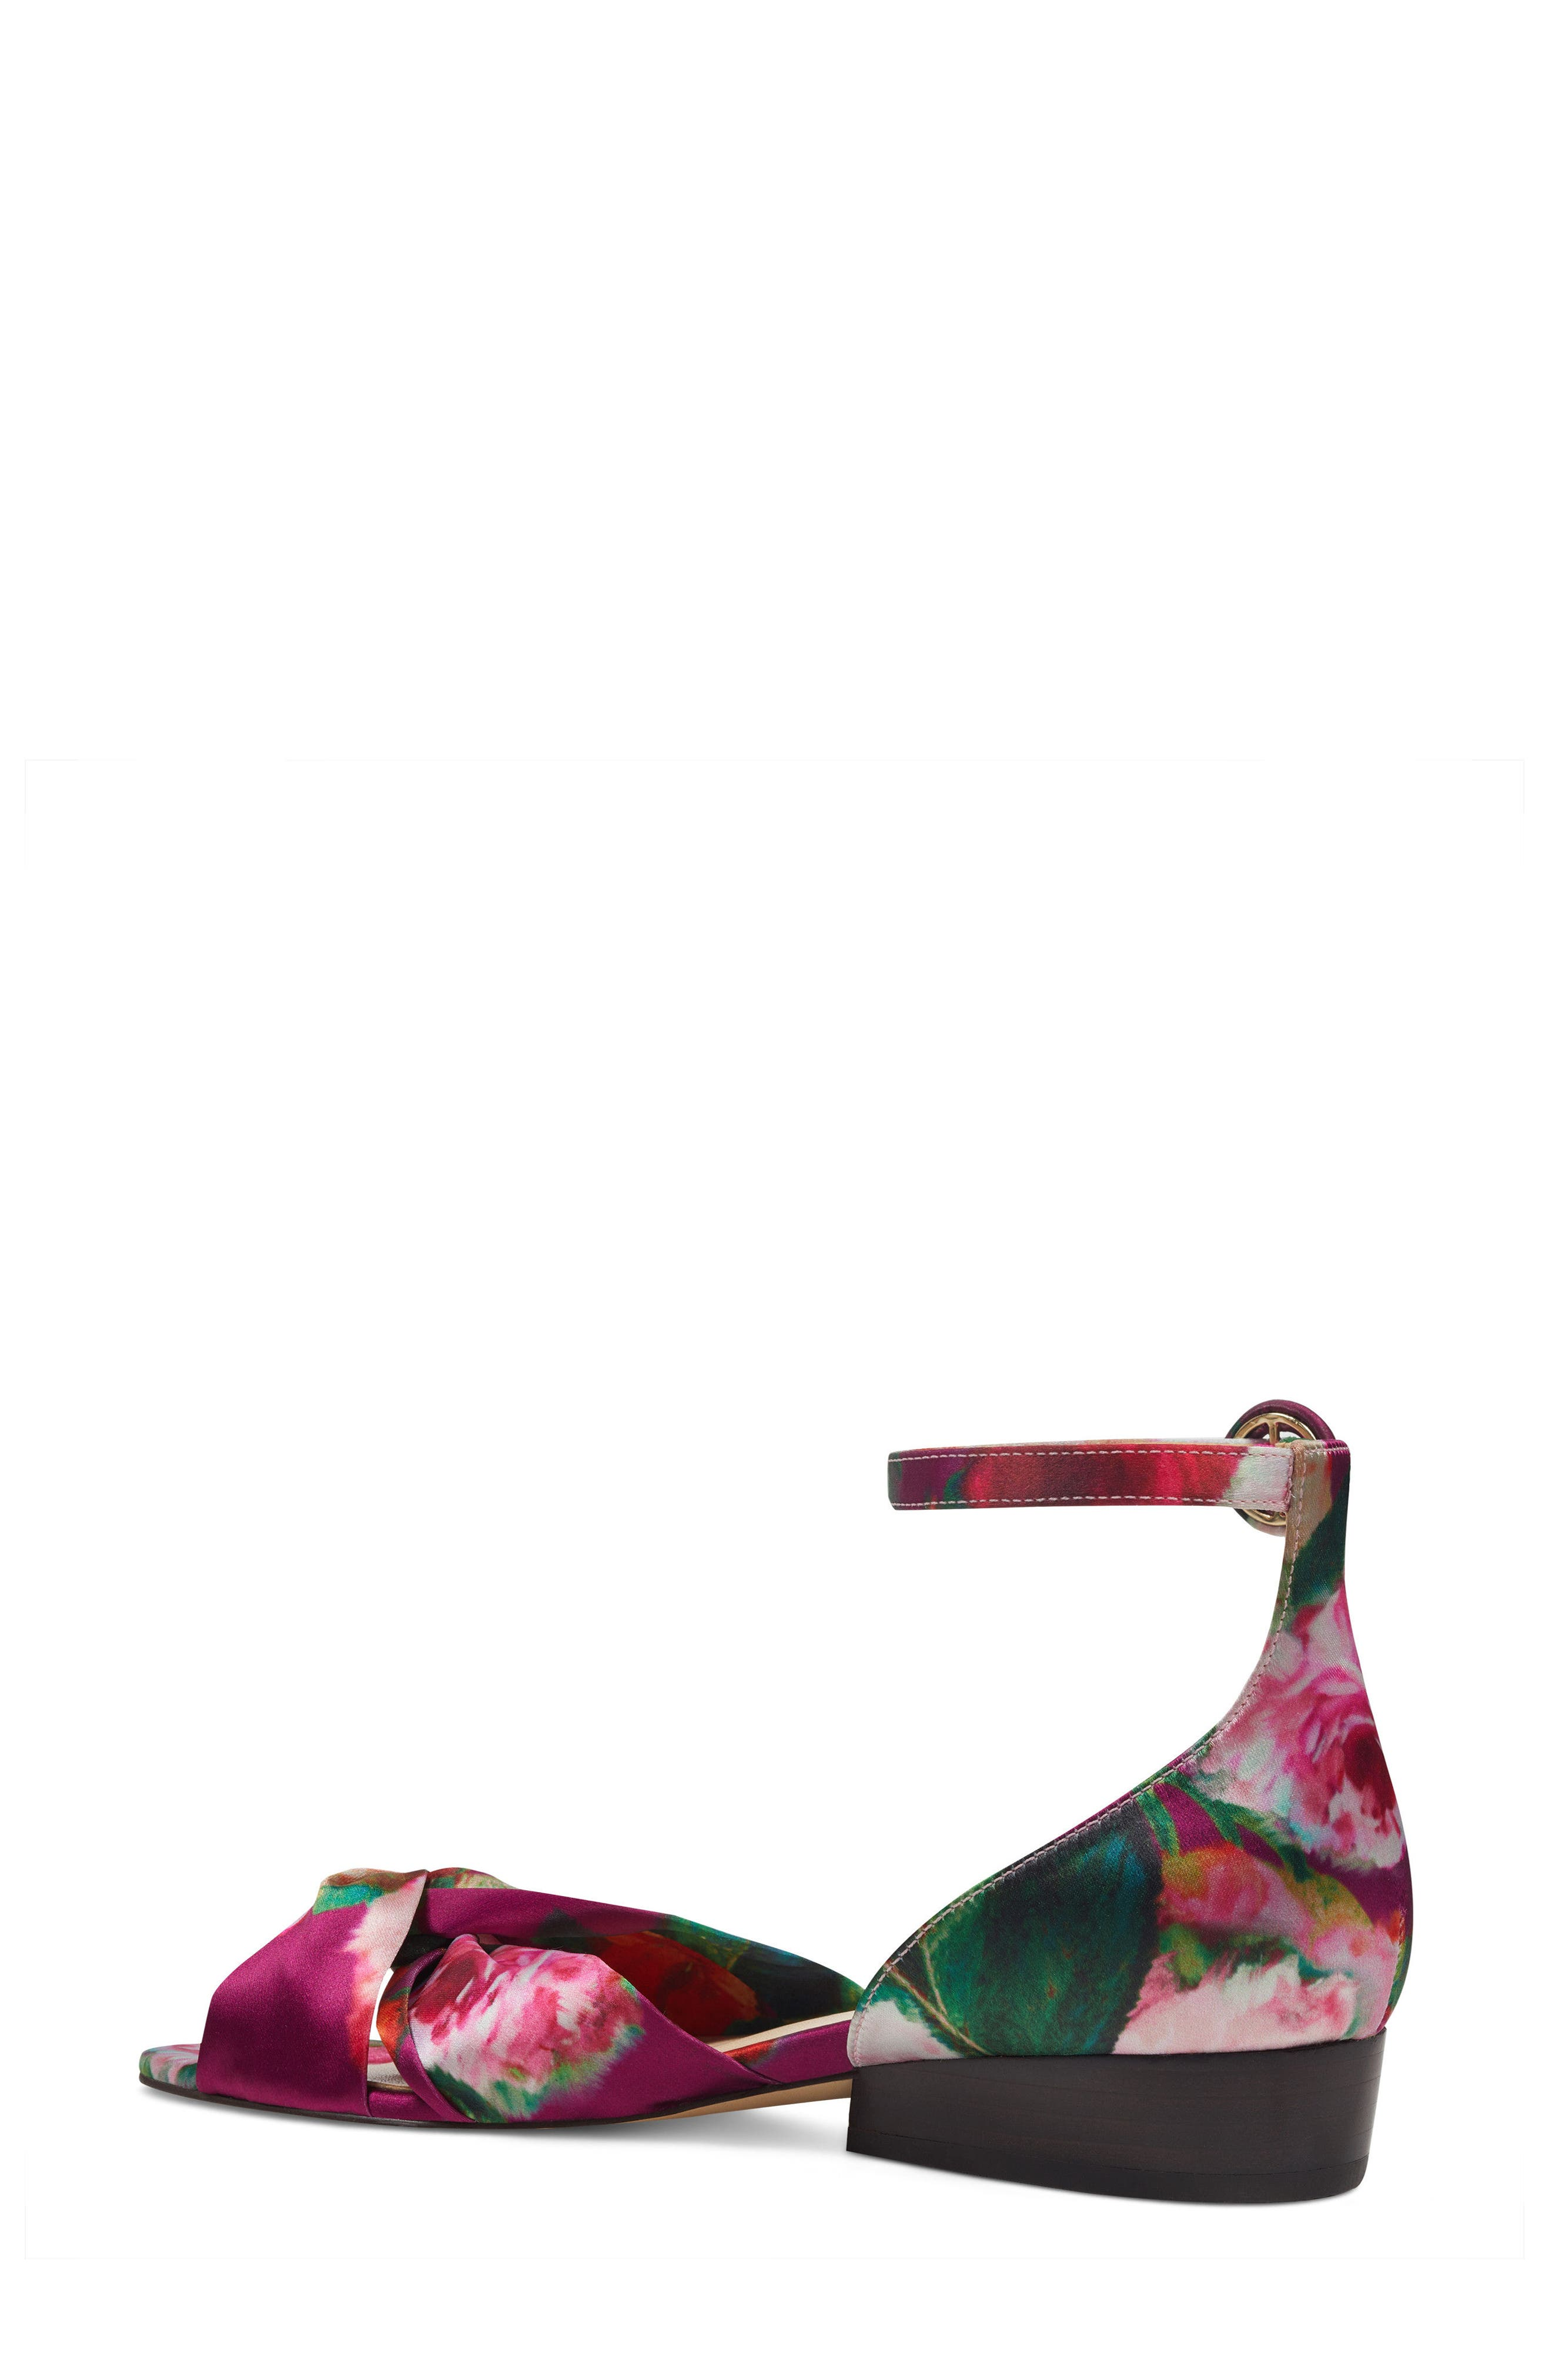 Lumsi Ankle Strap Sandal,                             Alternate thumbnail 2, color,                             Pink Multi Satin